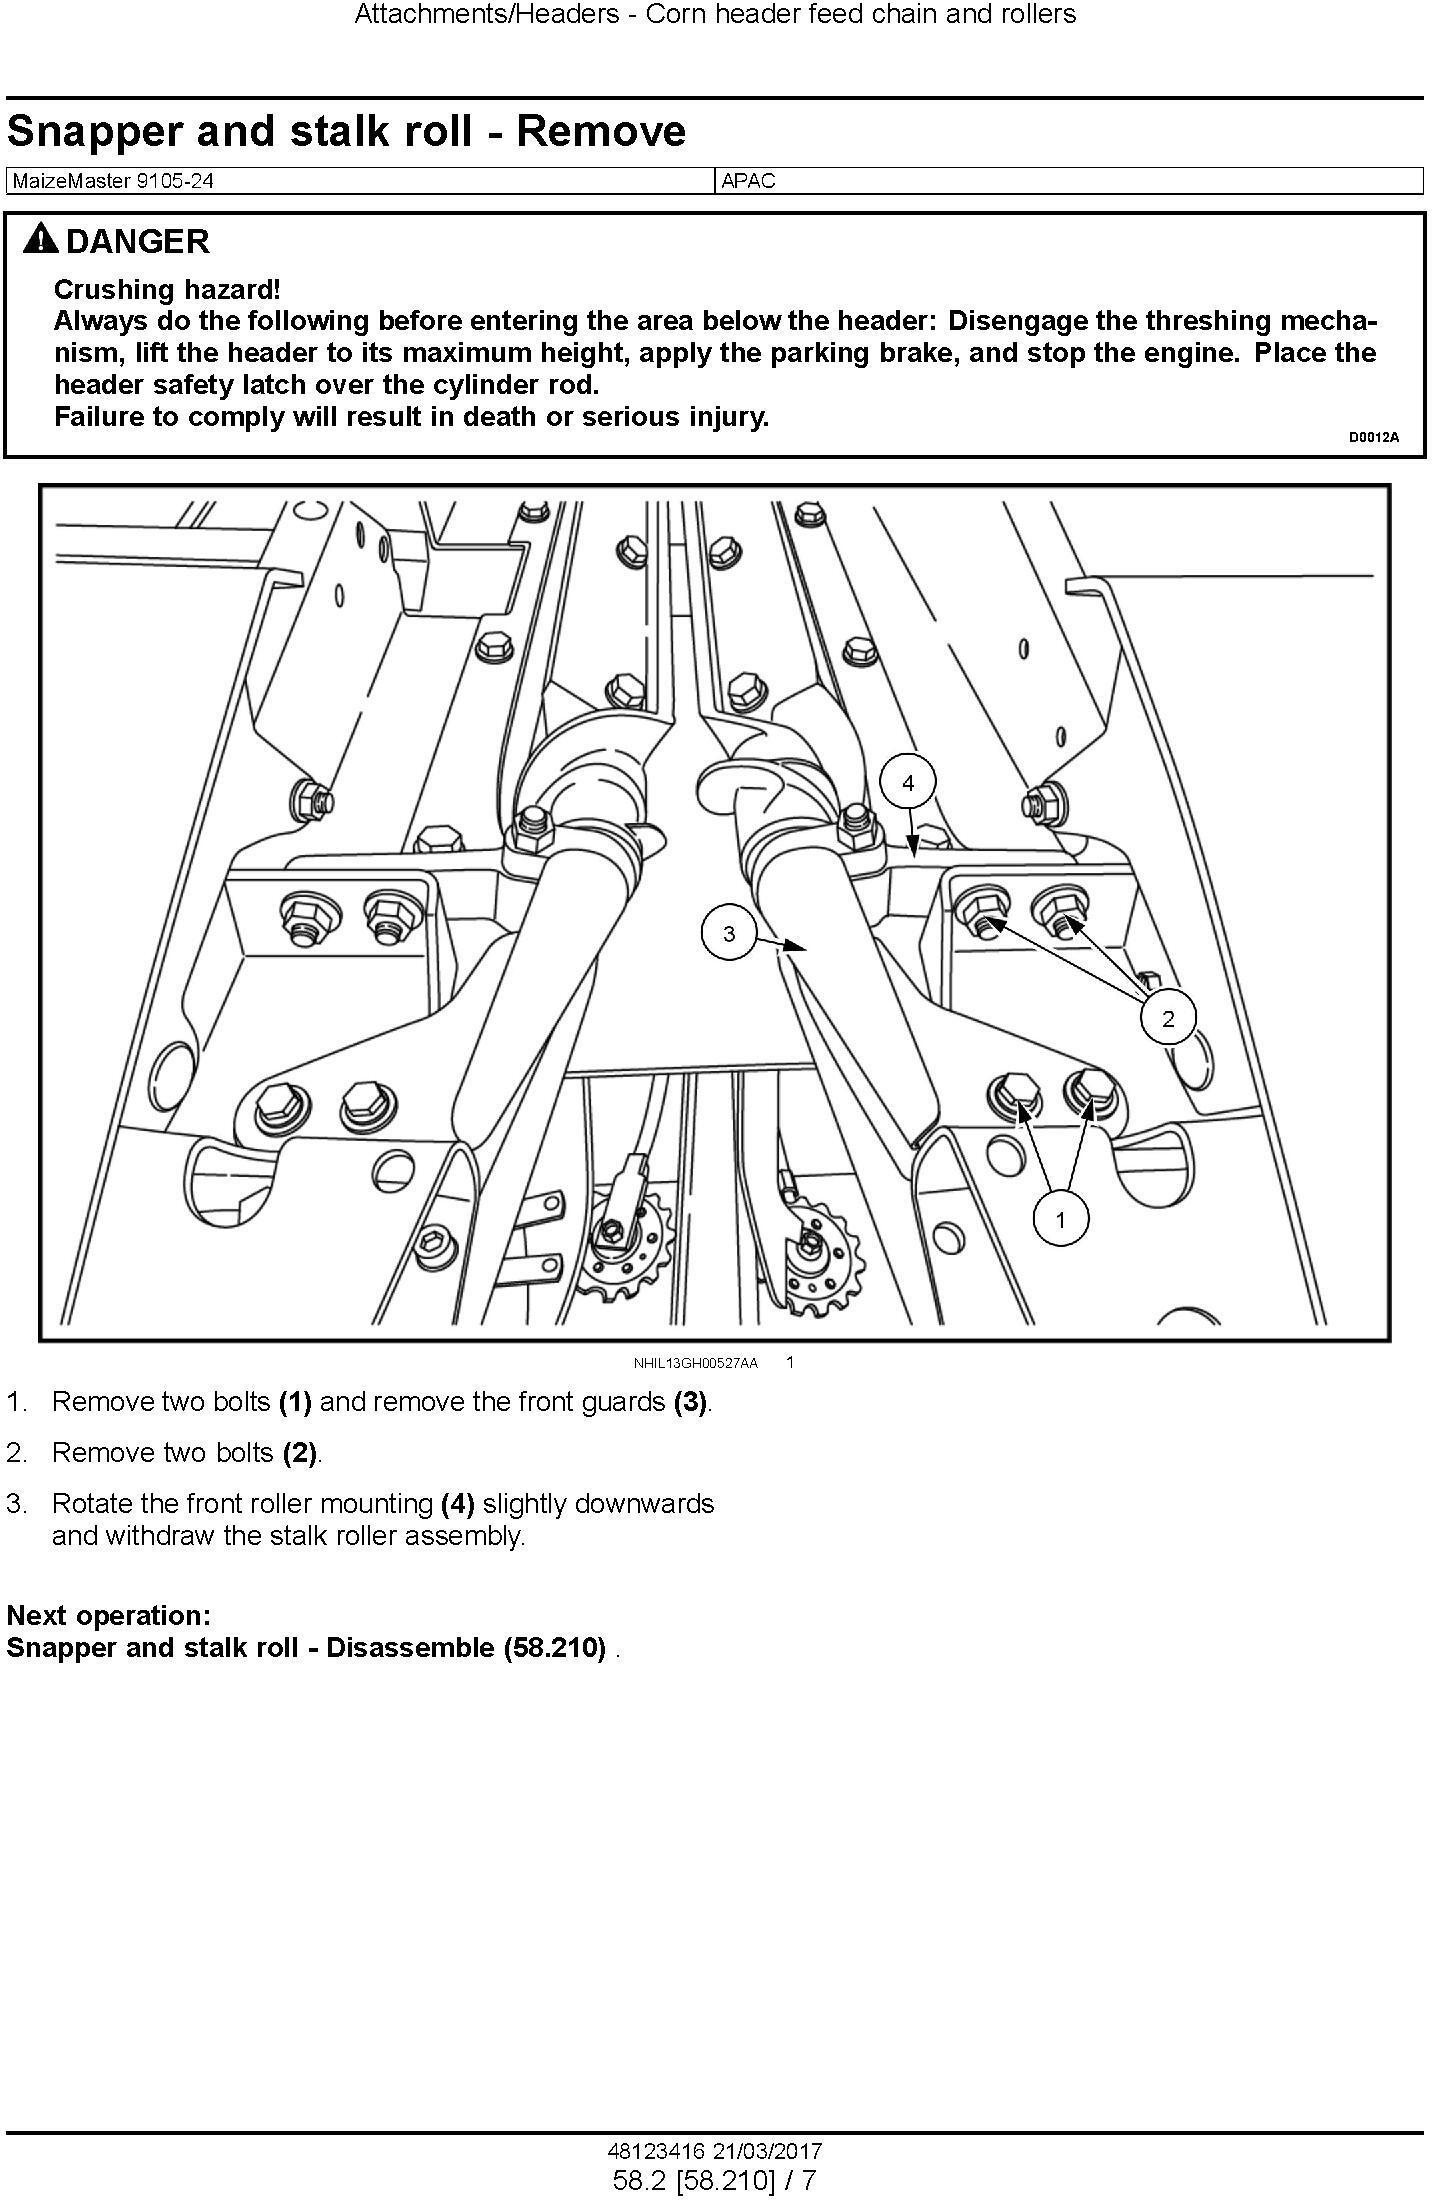 New Holland MaizeMaster 9105-24 Corn header Service Manual - 3